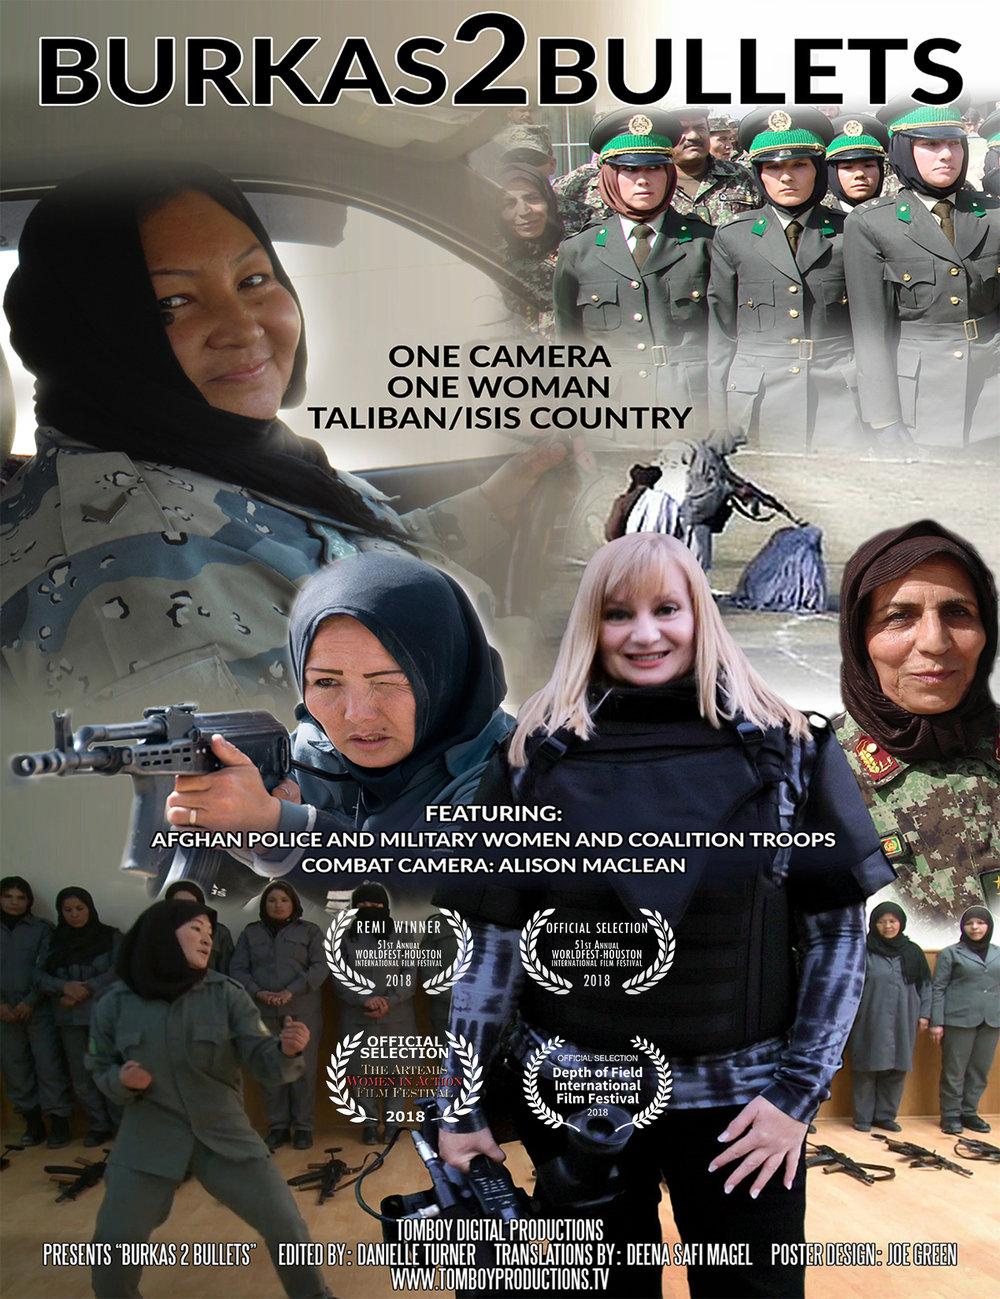 Burkas2Bullets Global Release 2019.  https://vimeo.com/272605600